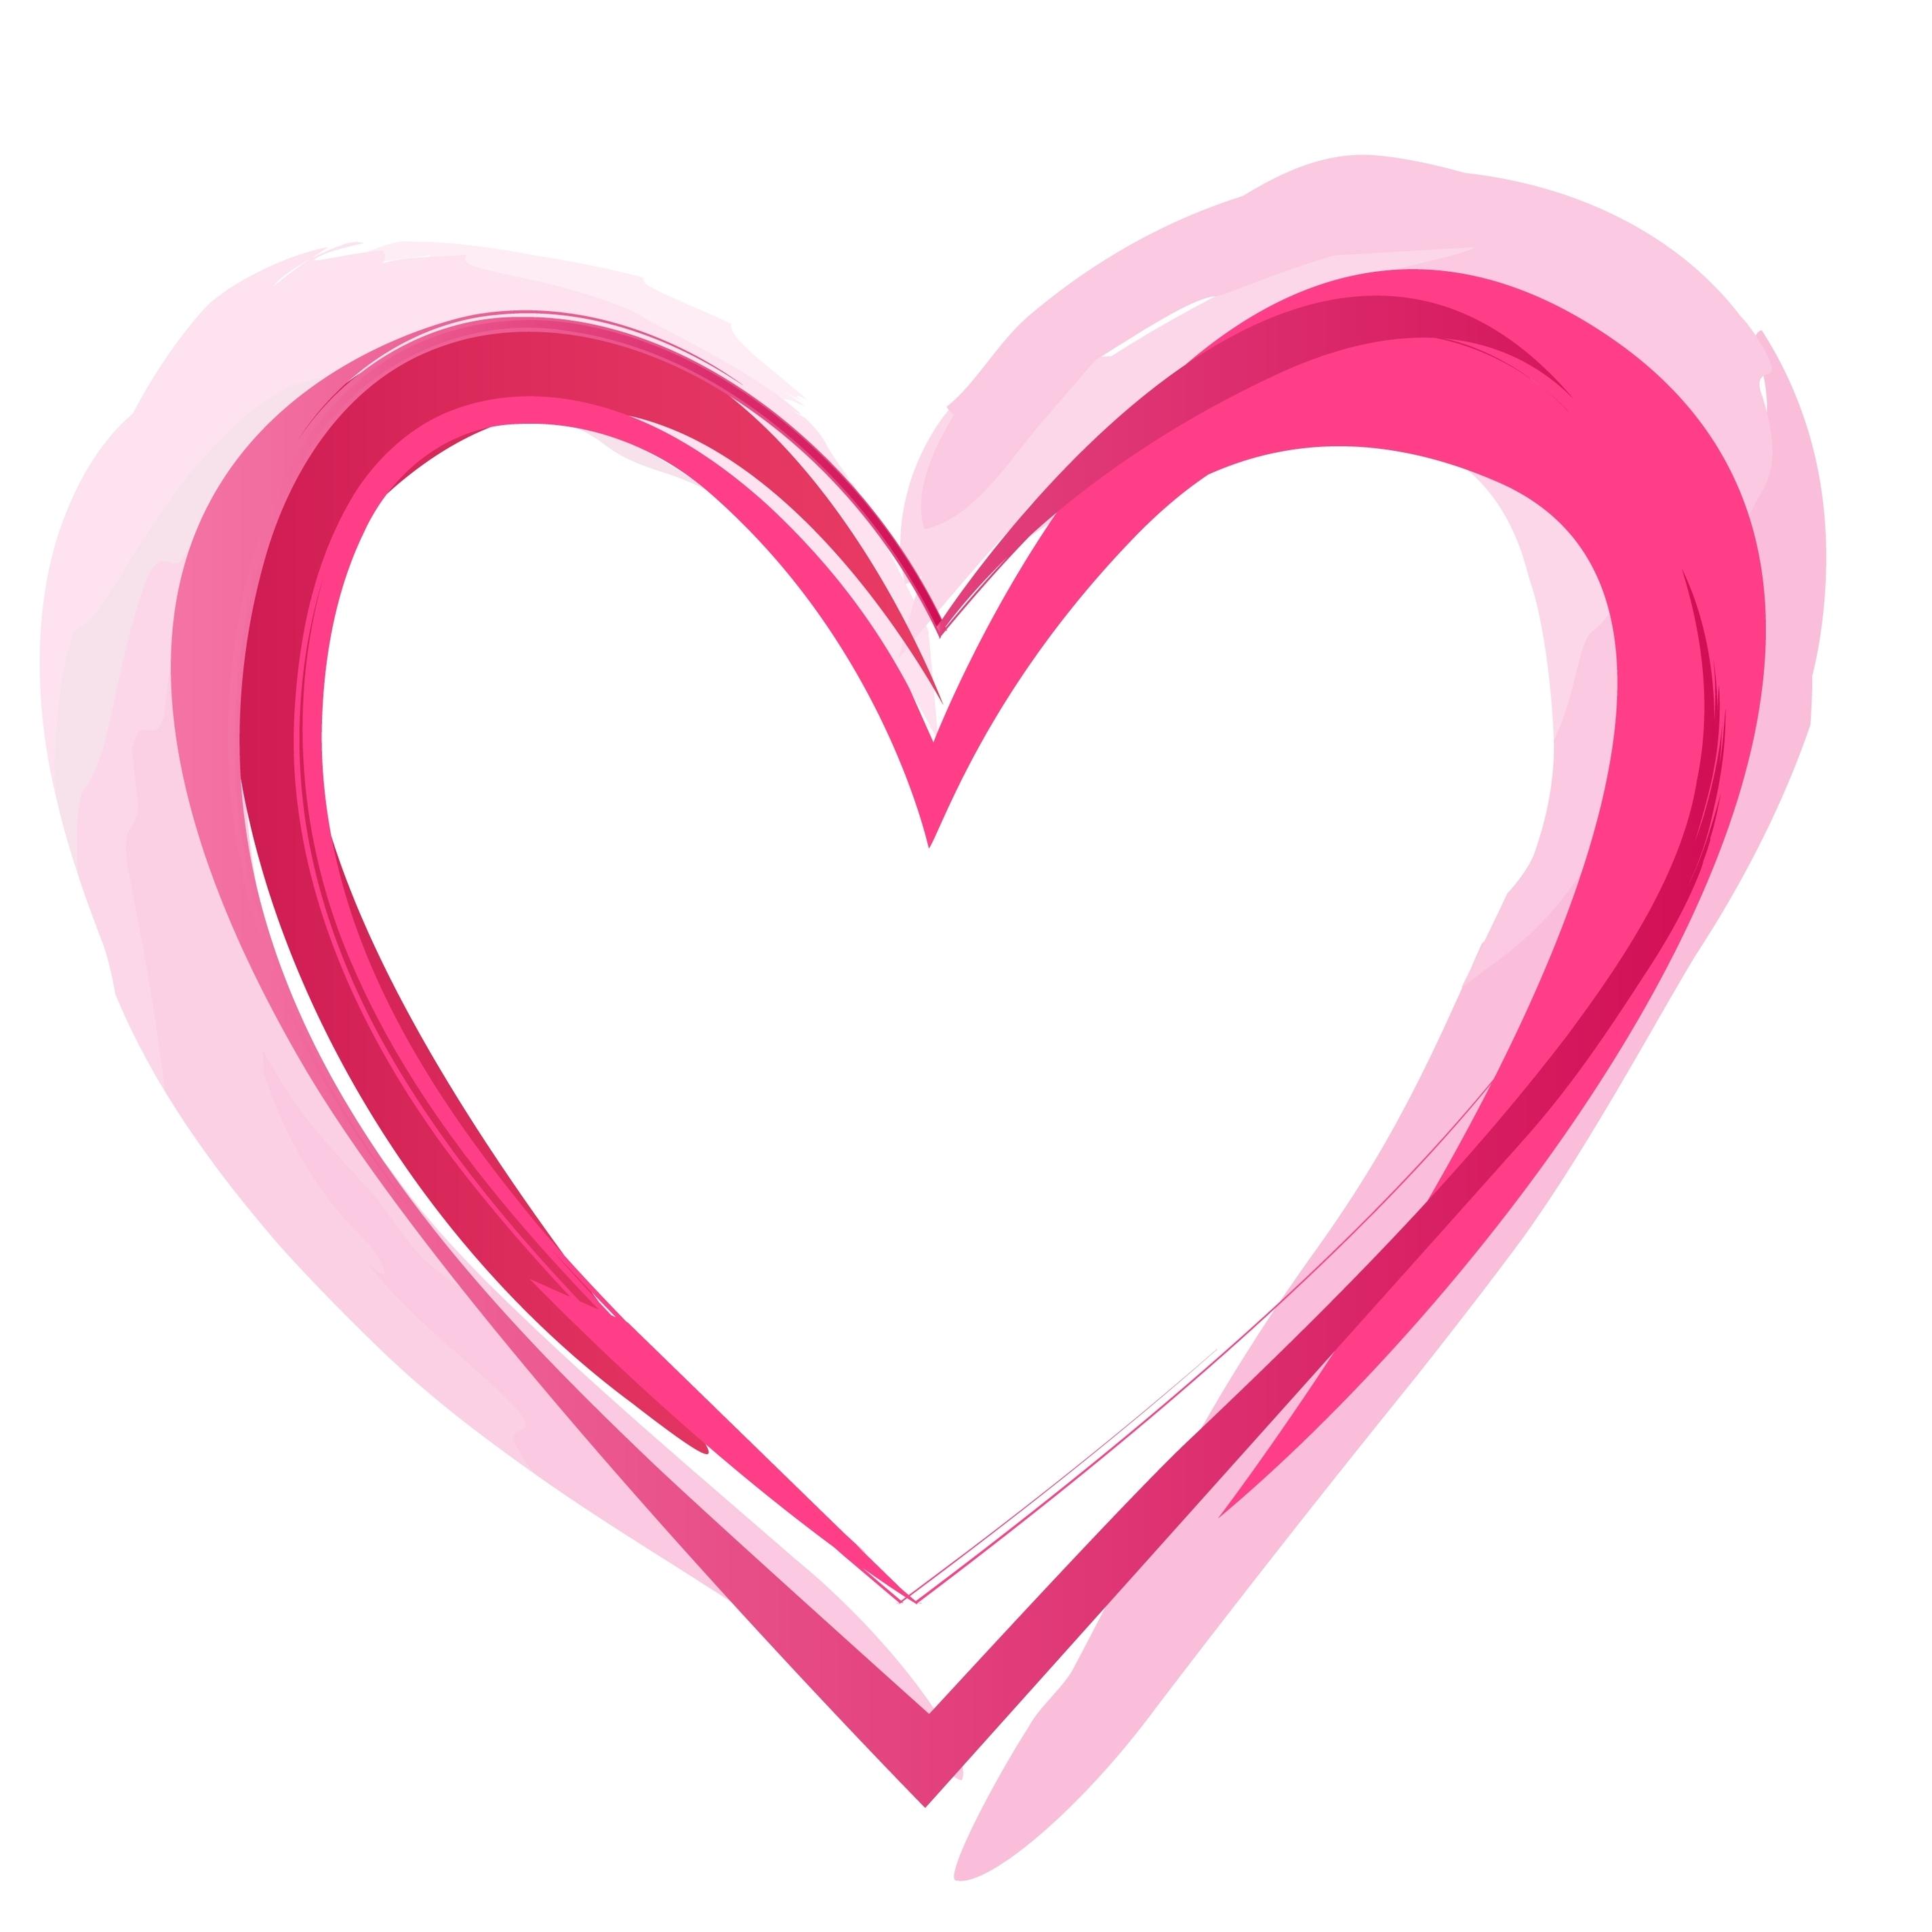 Heart Outline Vector